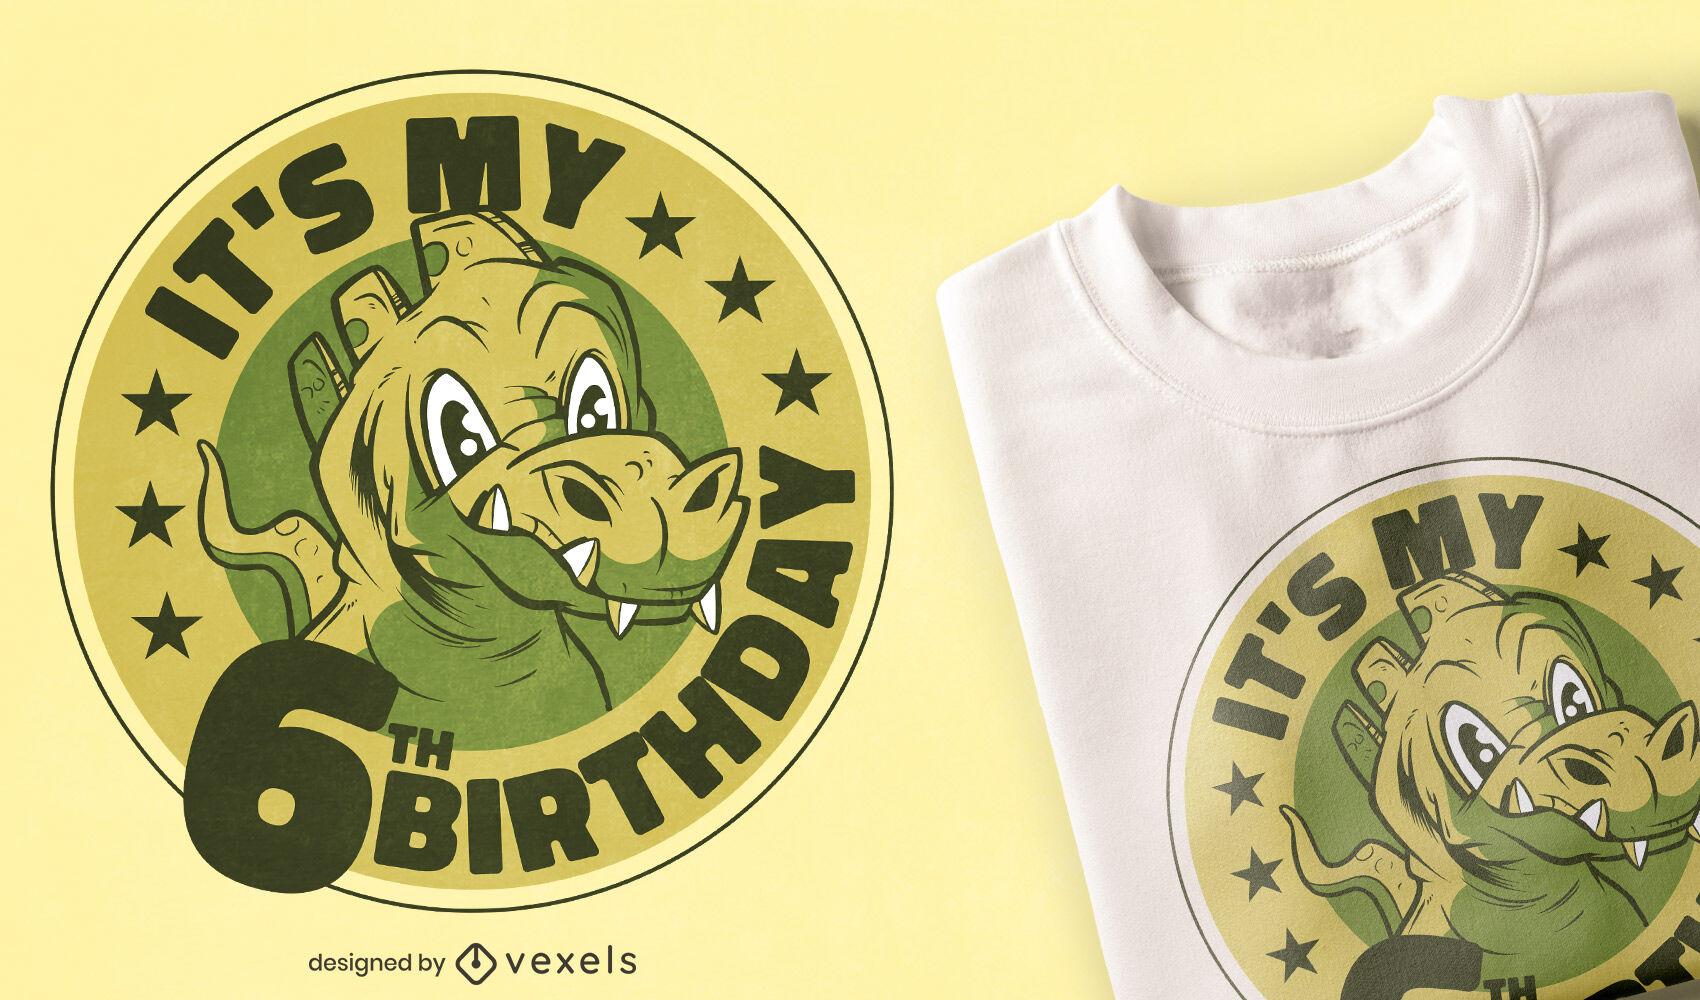 Dinosaurier sechster Geburtstag T-Shirt Design